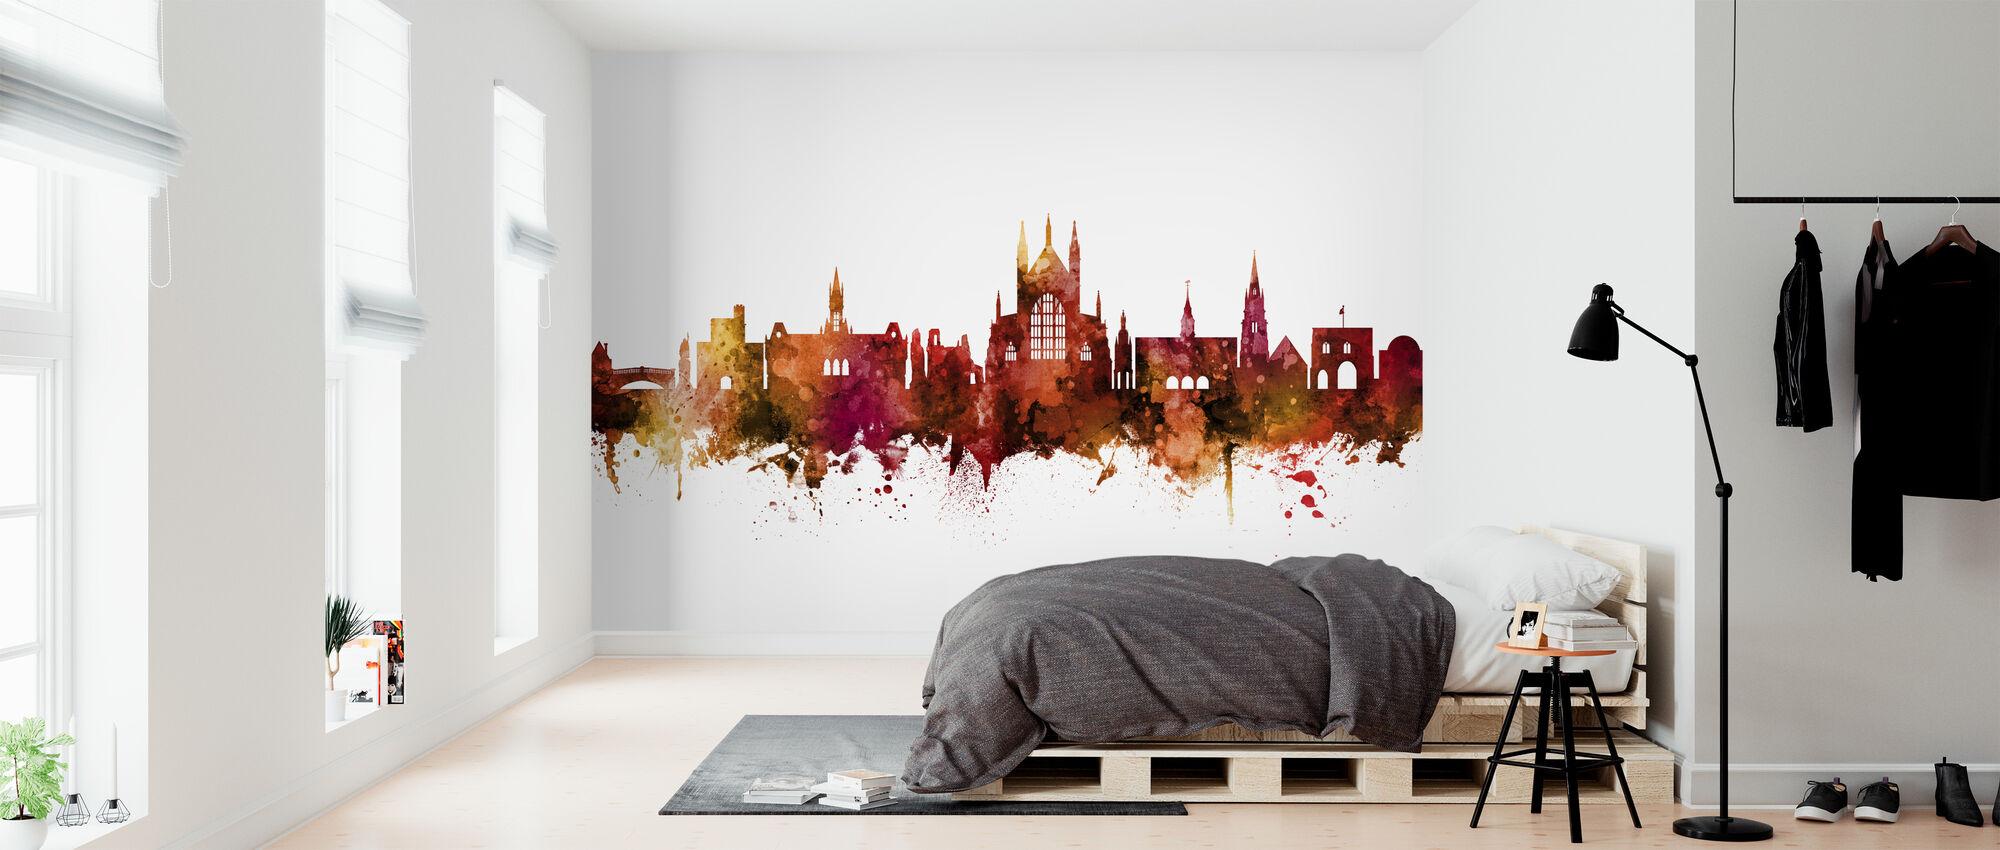 Winchester England Skyline - Wallpaper - Bedroom